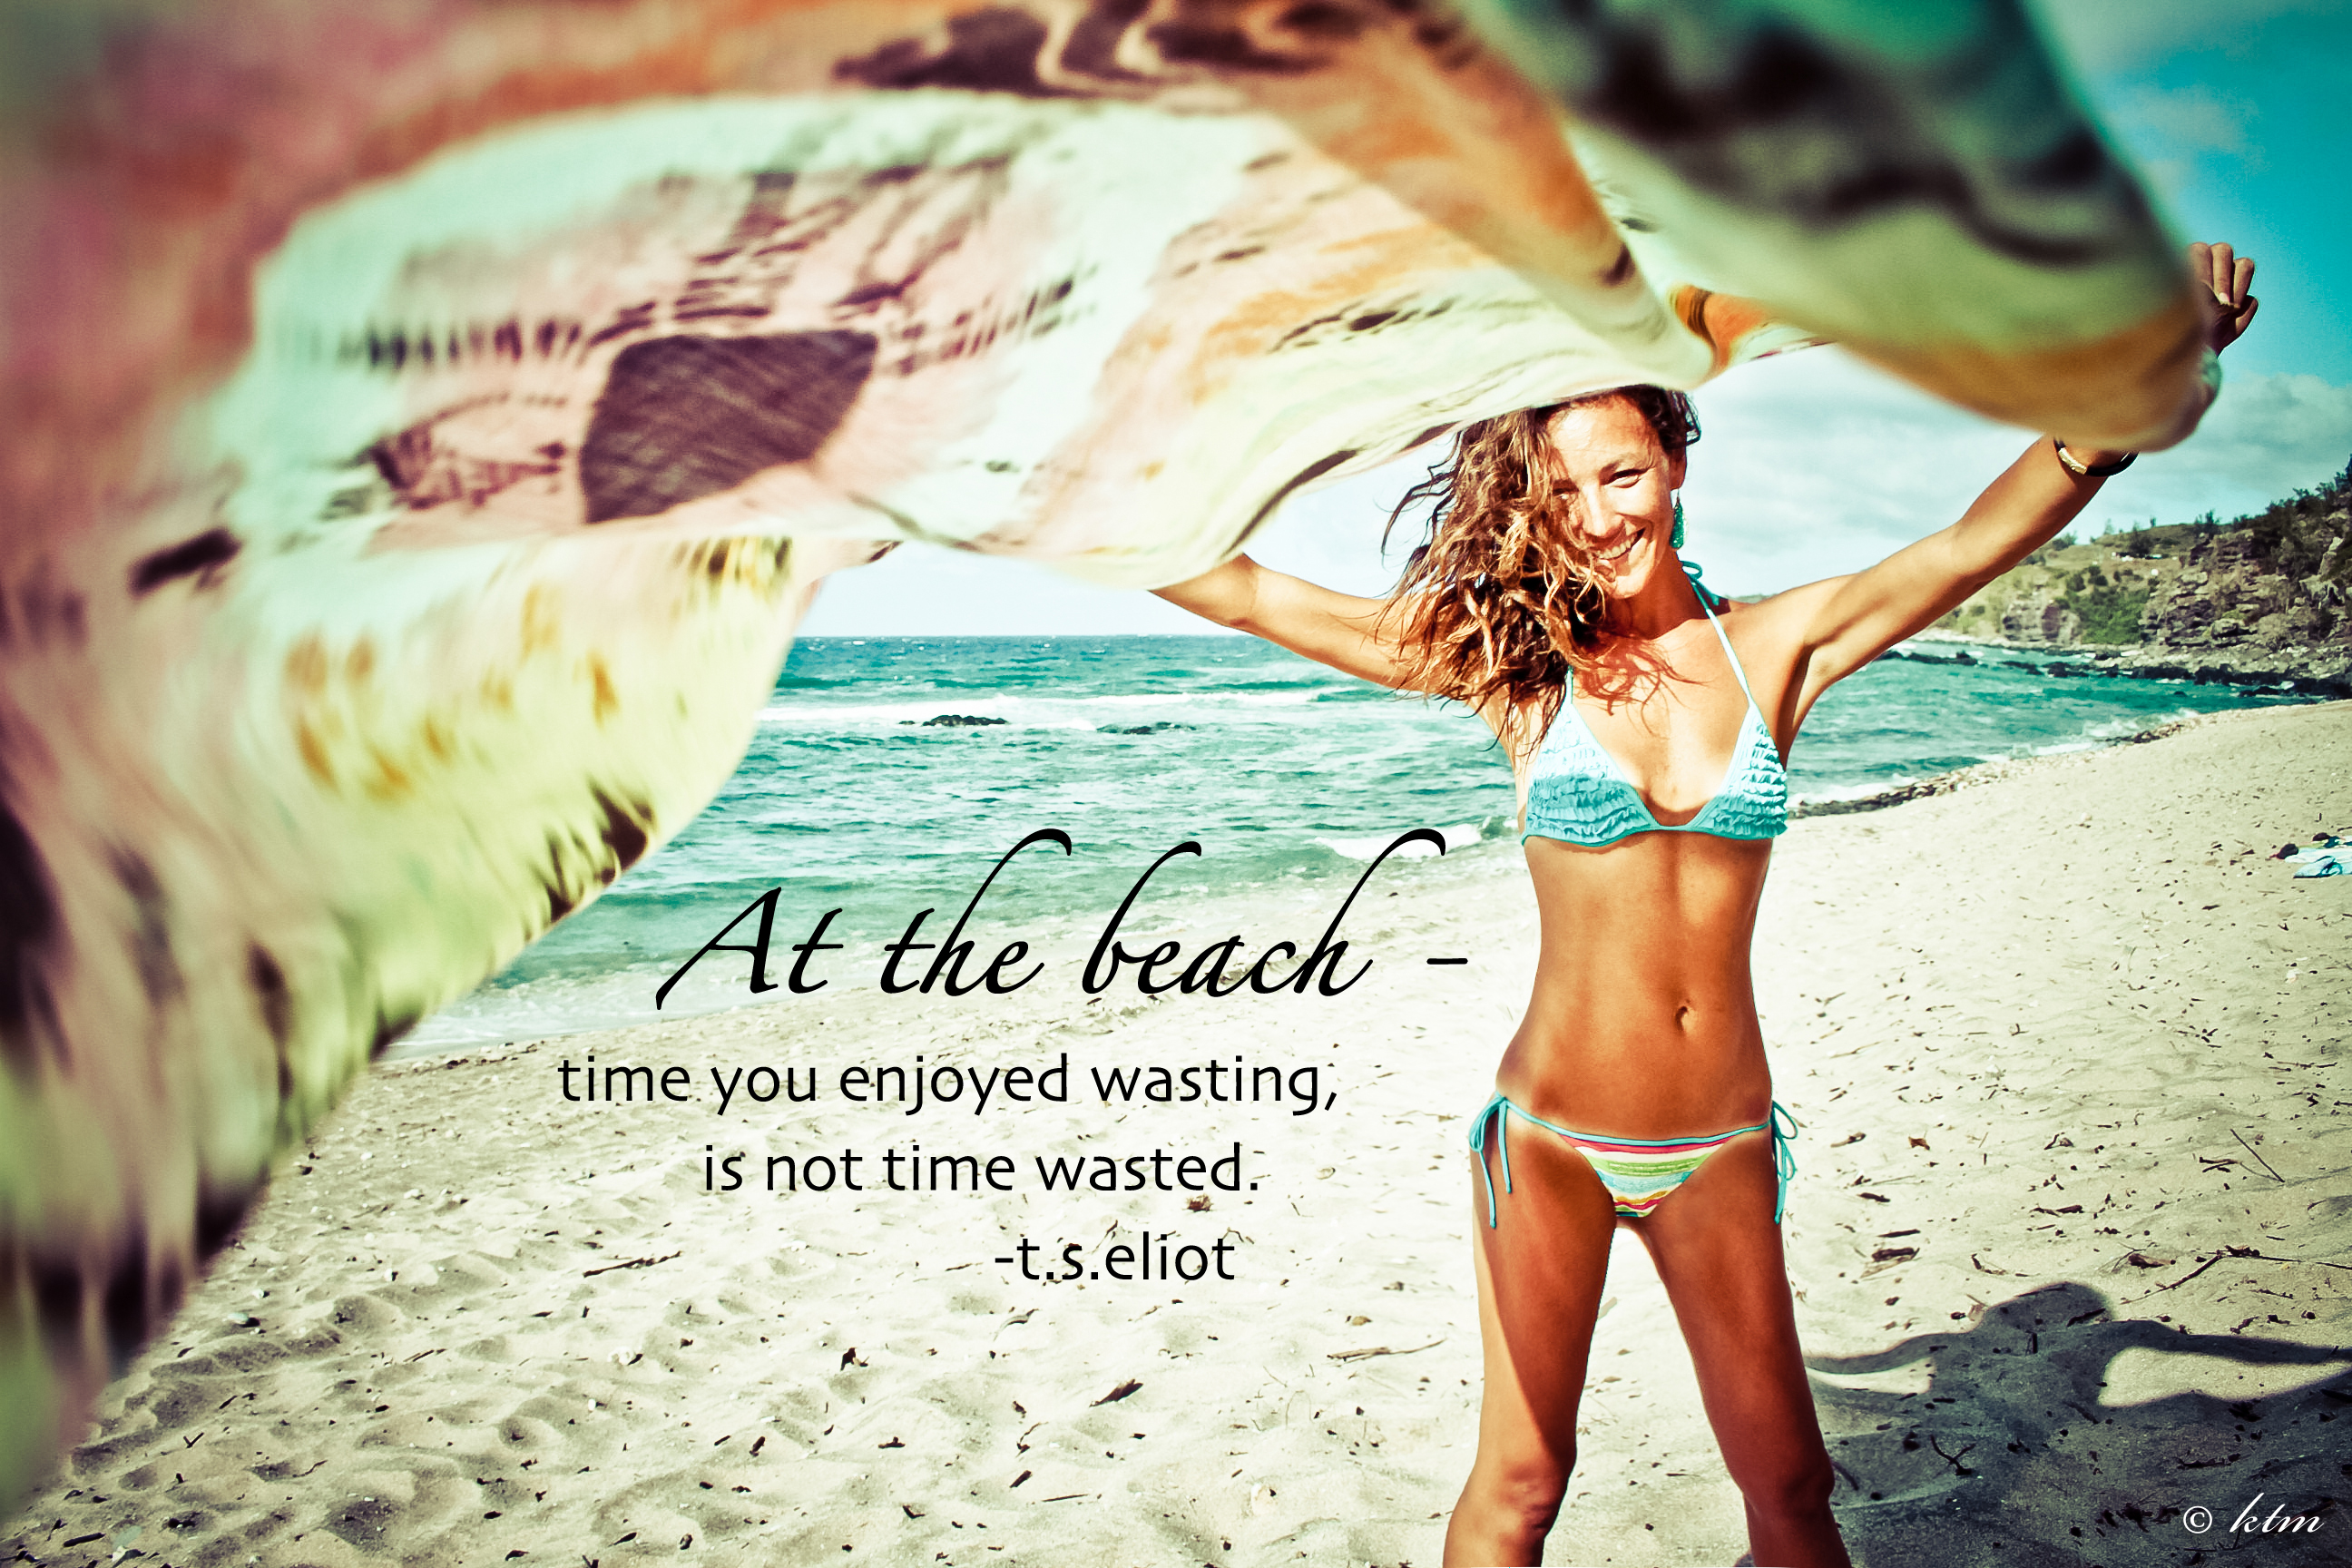 Beach quote #5